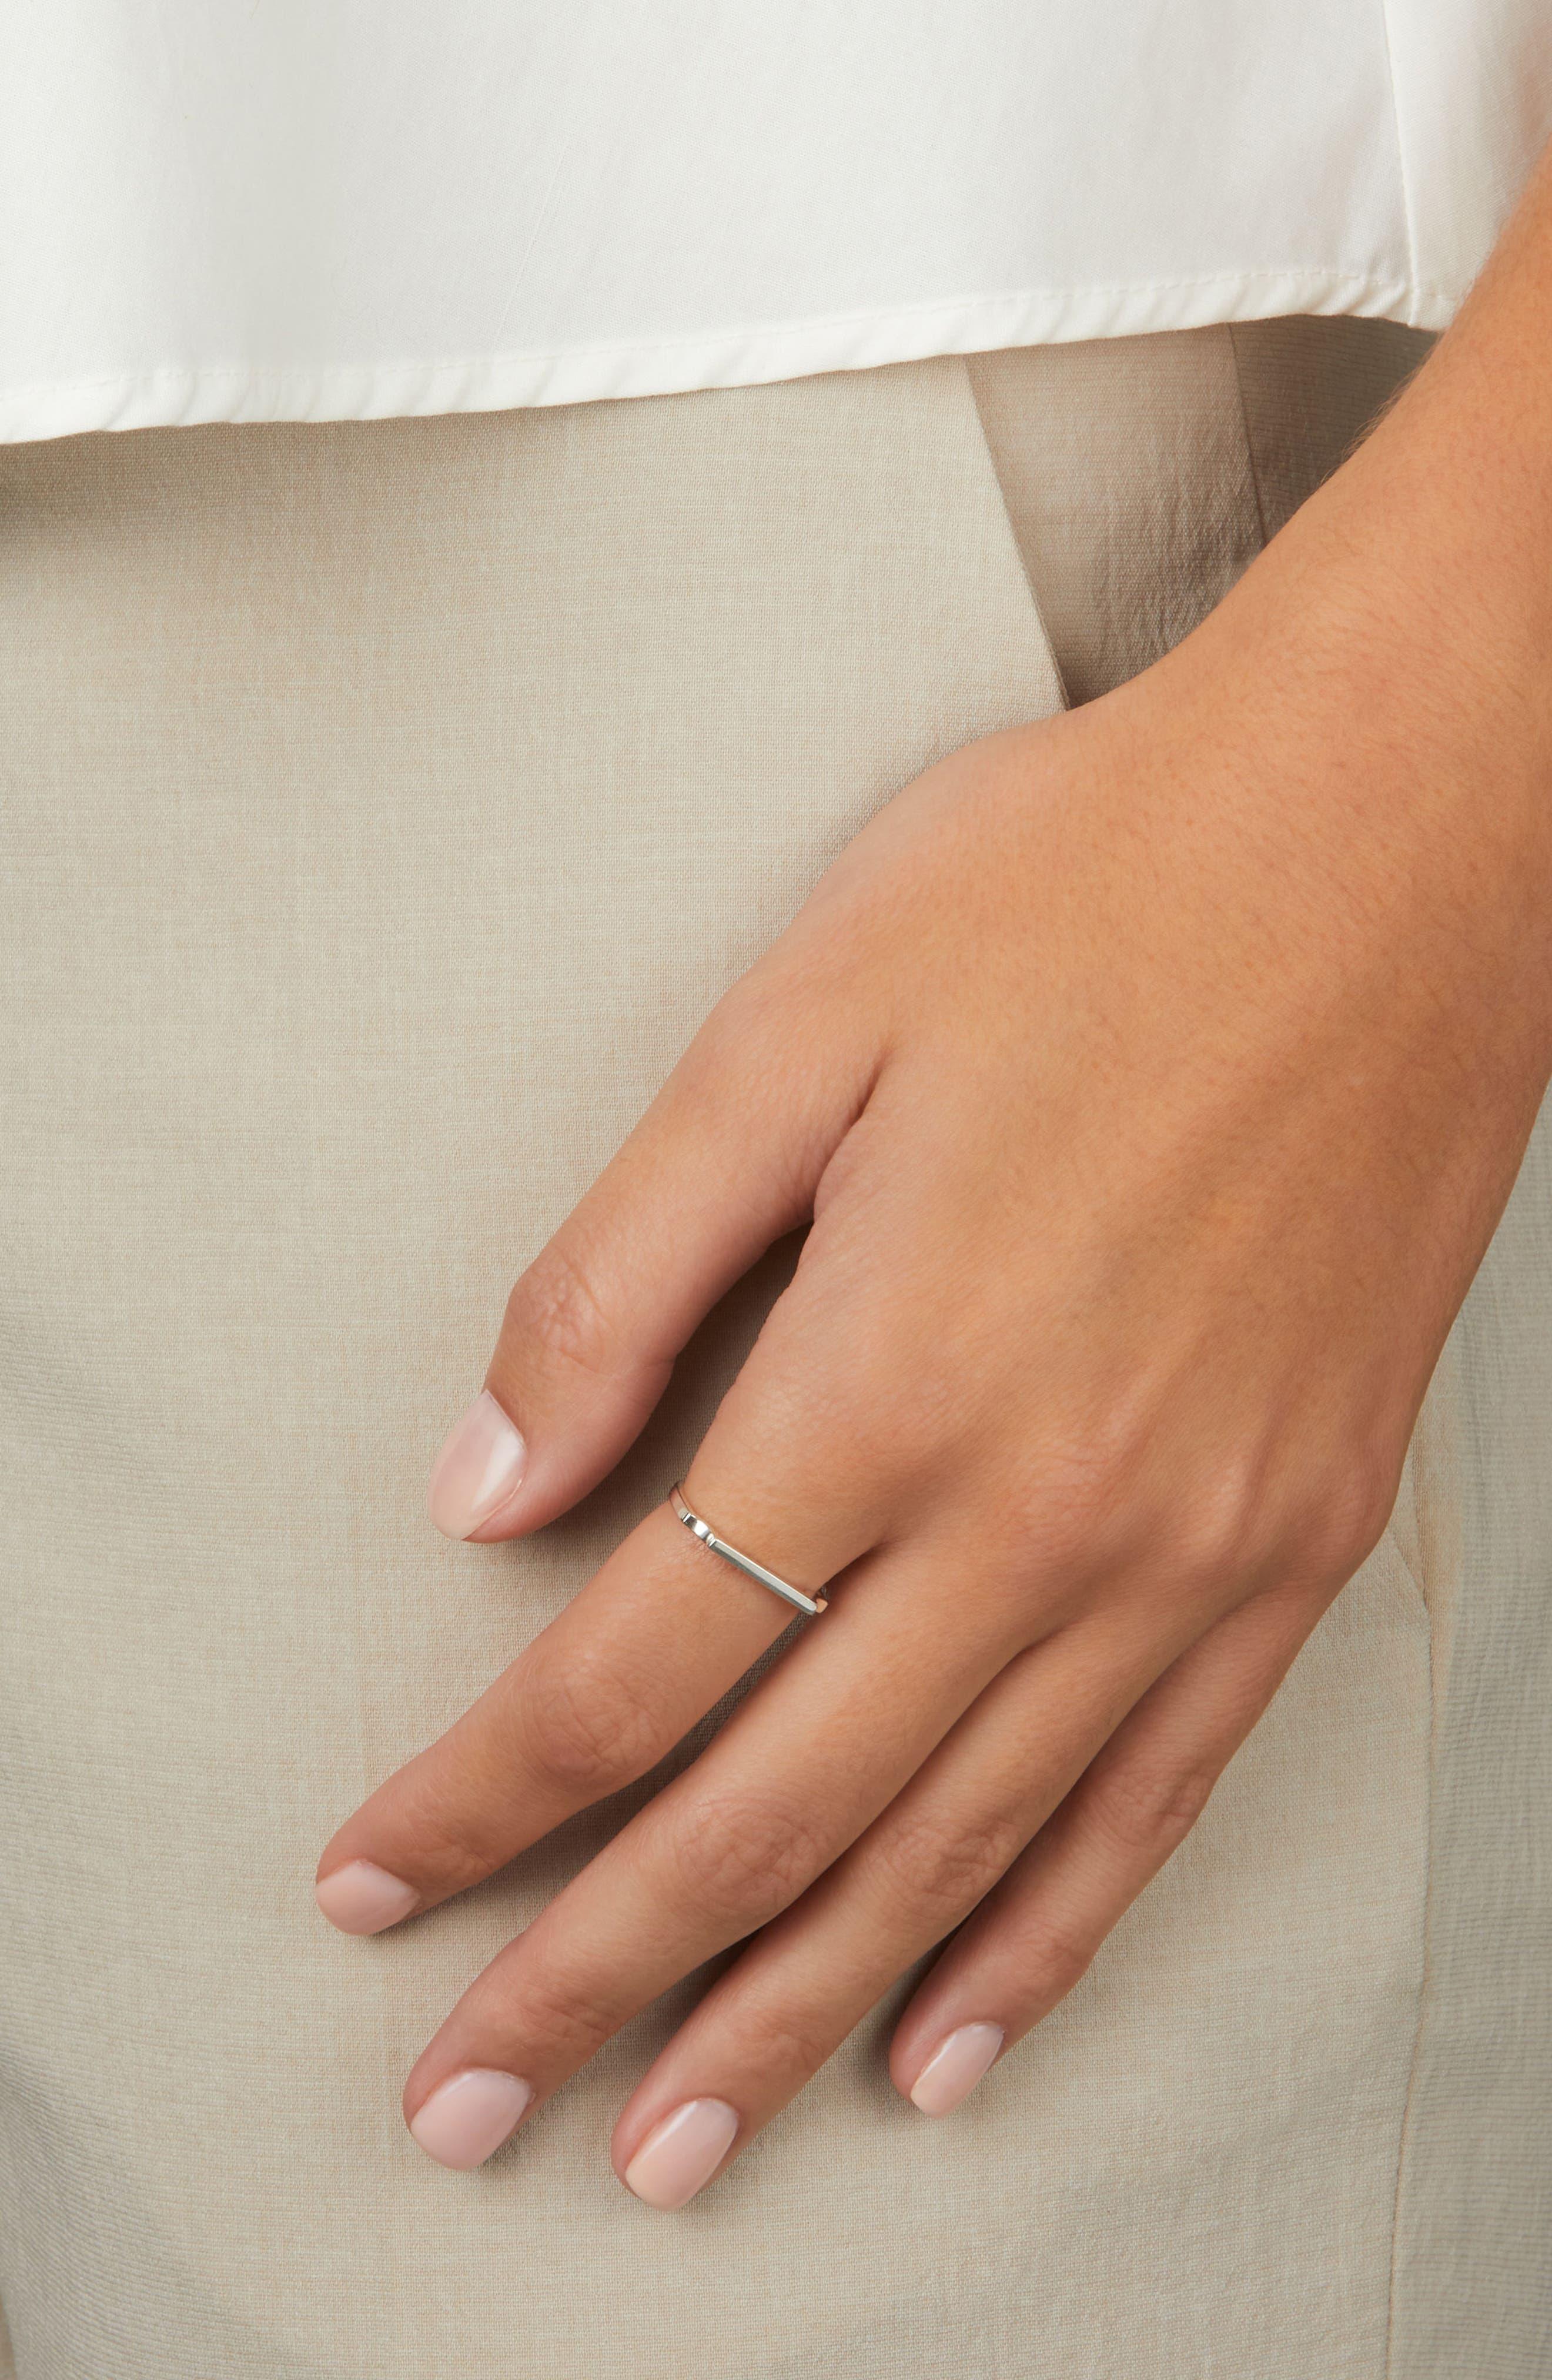 MONICA VINADER, Signature Thin Ring, Alternate thumbnail 4, color, SILVER